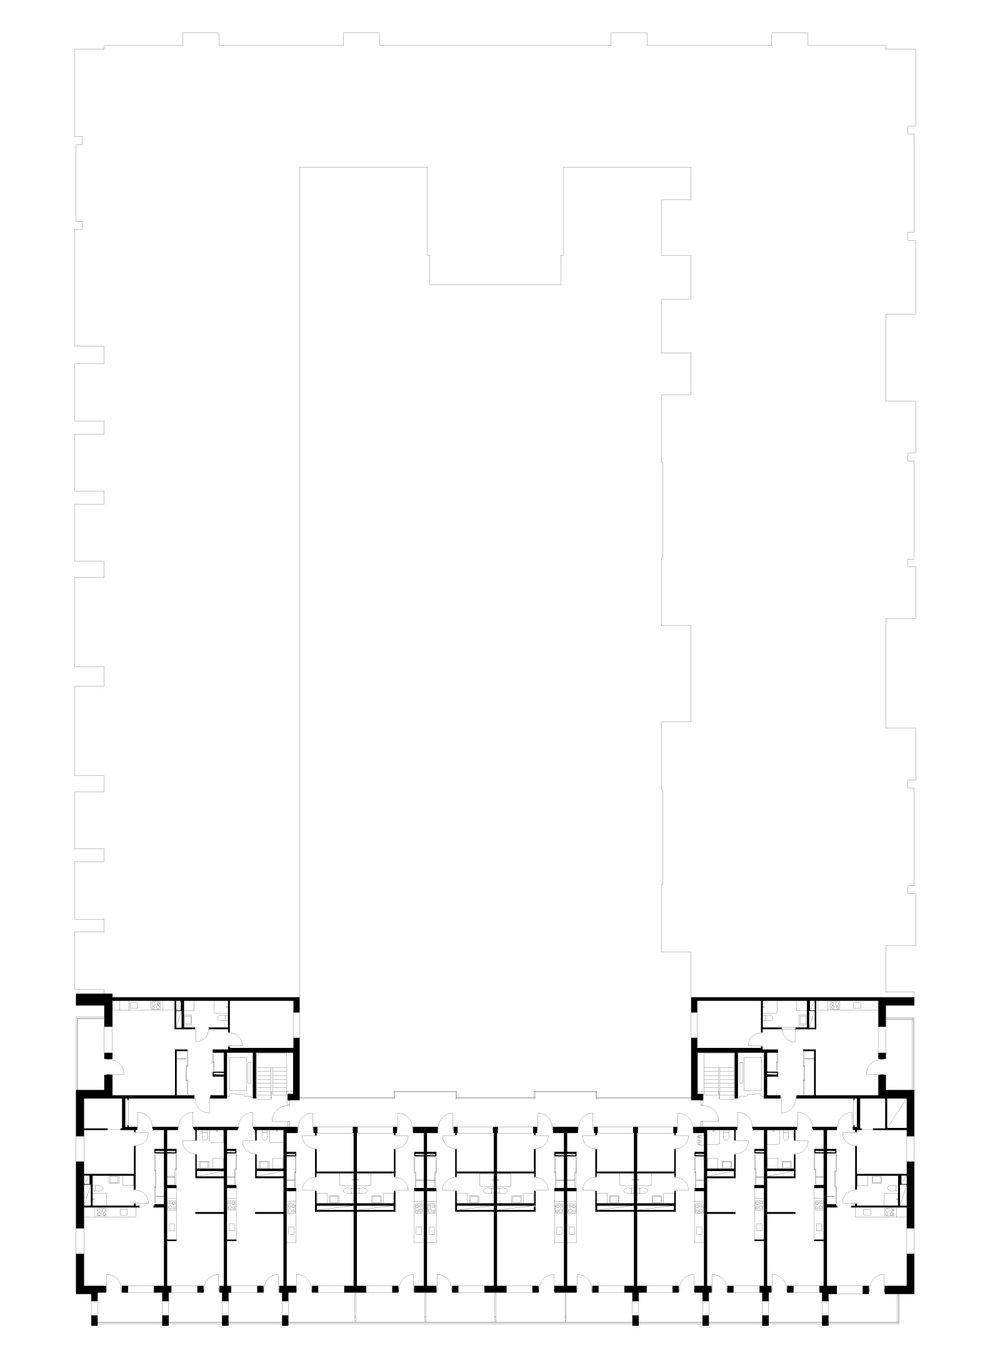 takträdgårdentypplan.jpg